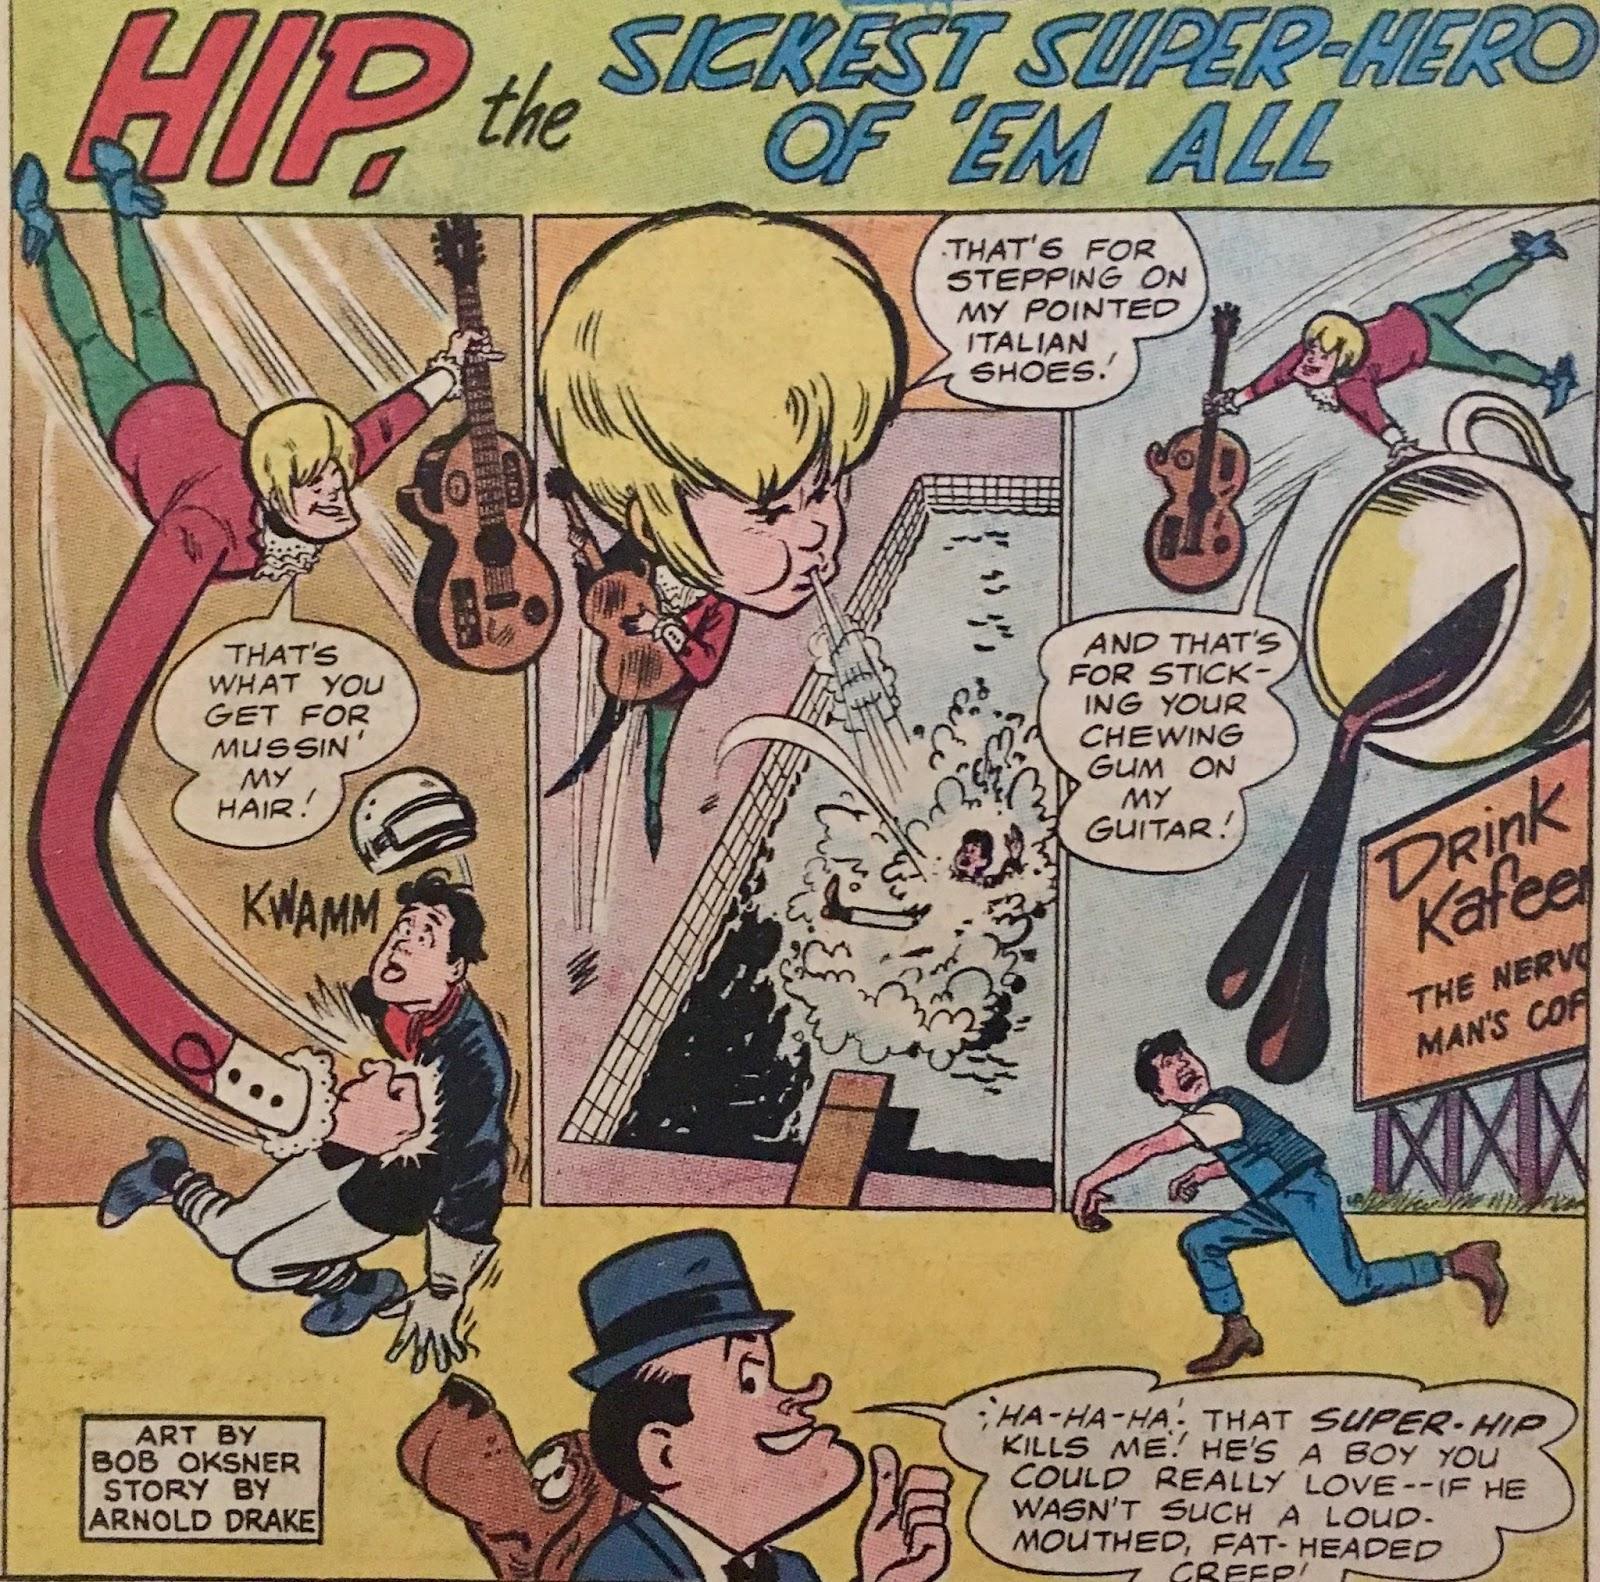 Chris is on Infinite Earths: Adventures of Bob Hope #95 (1965)